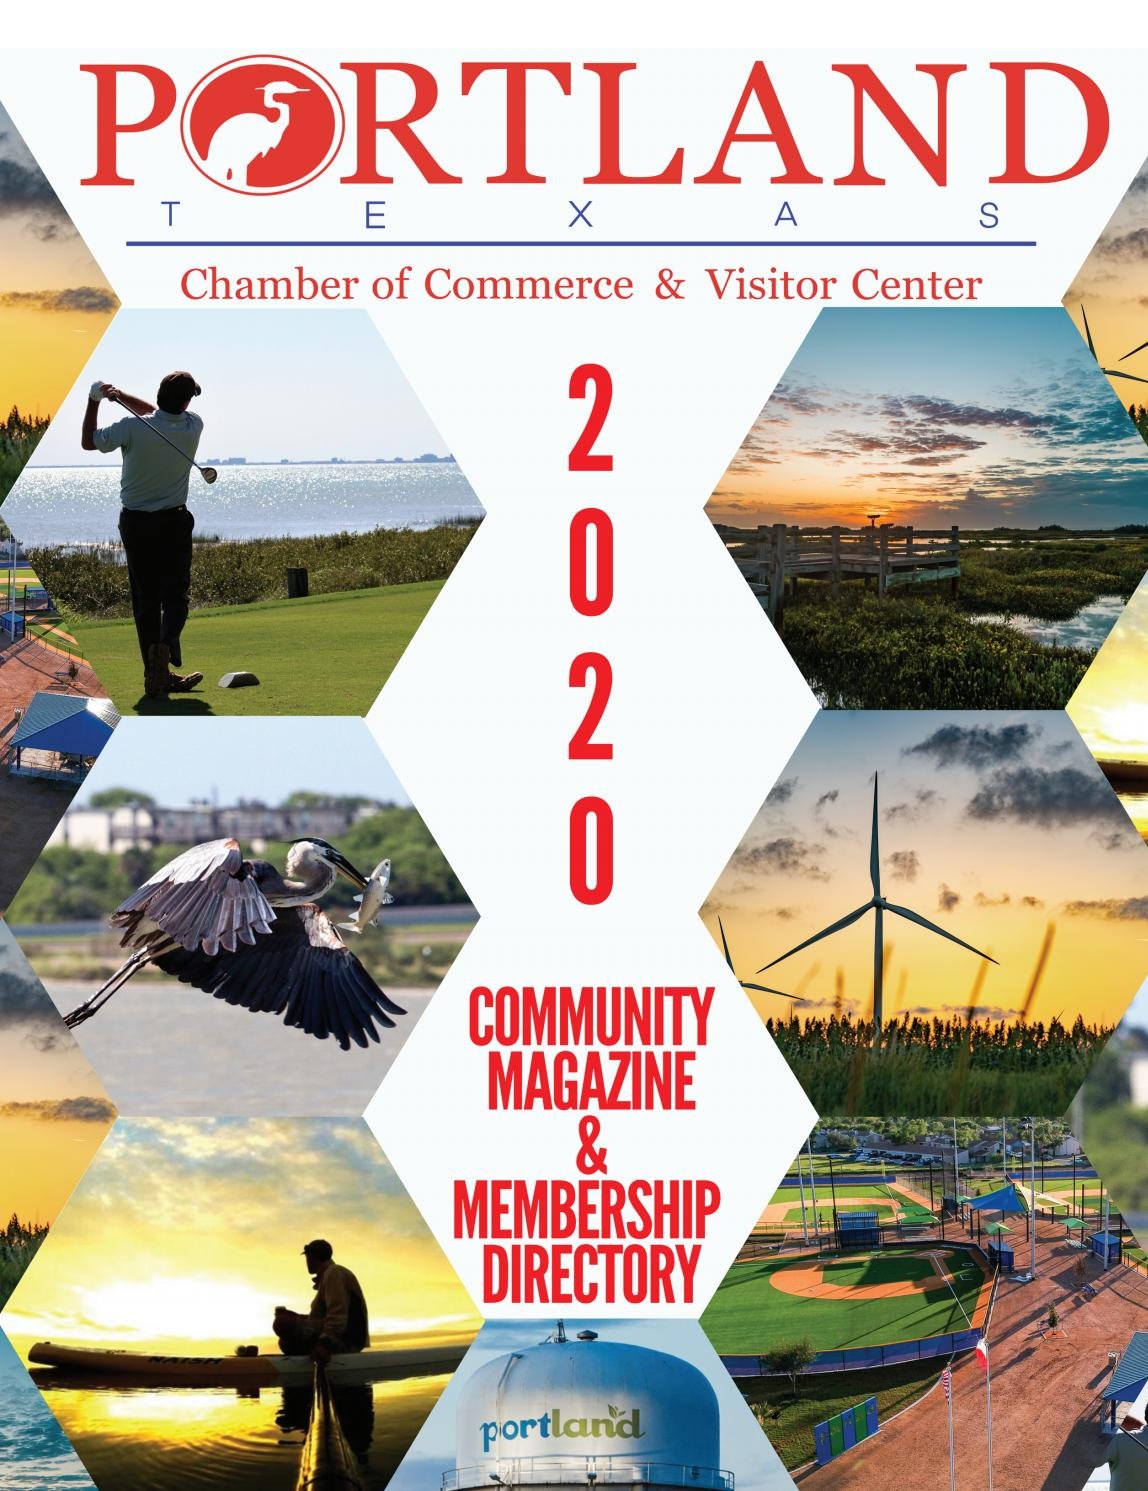 coastal choice media portland chamber guide 37118 by digital publisher issuu issuu